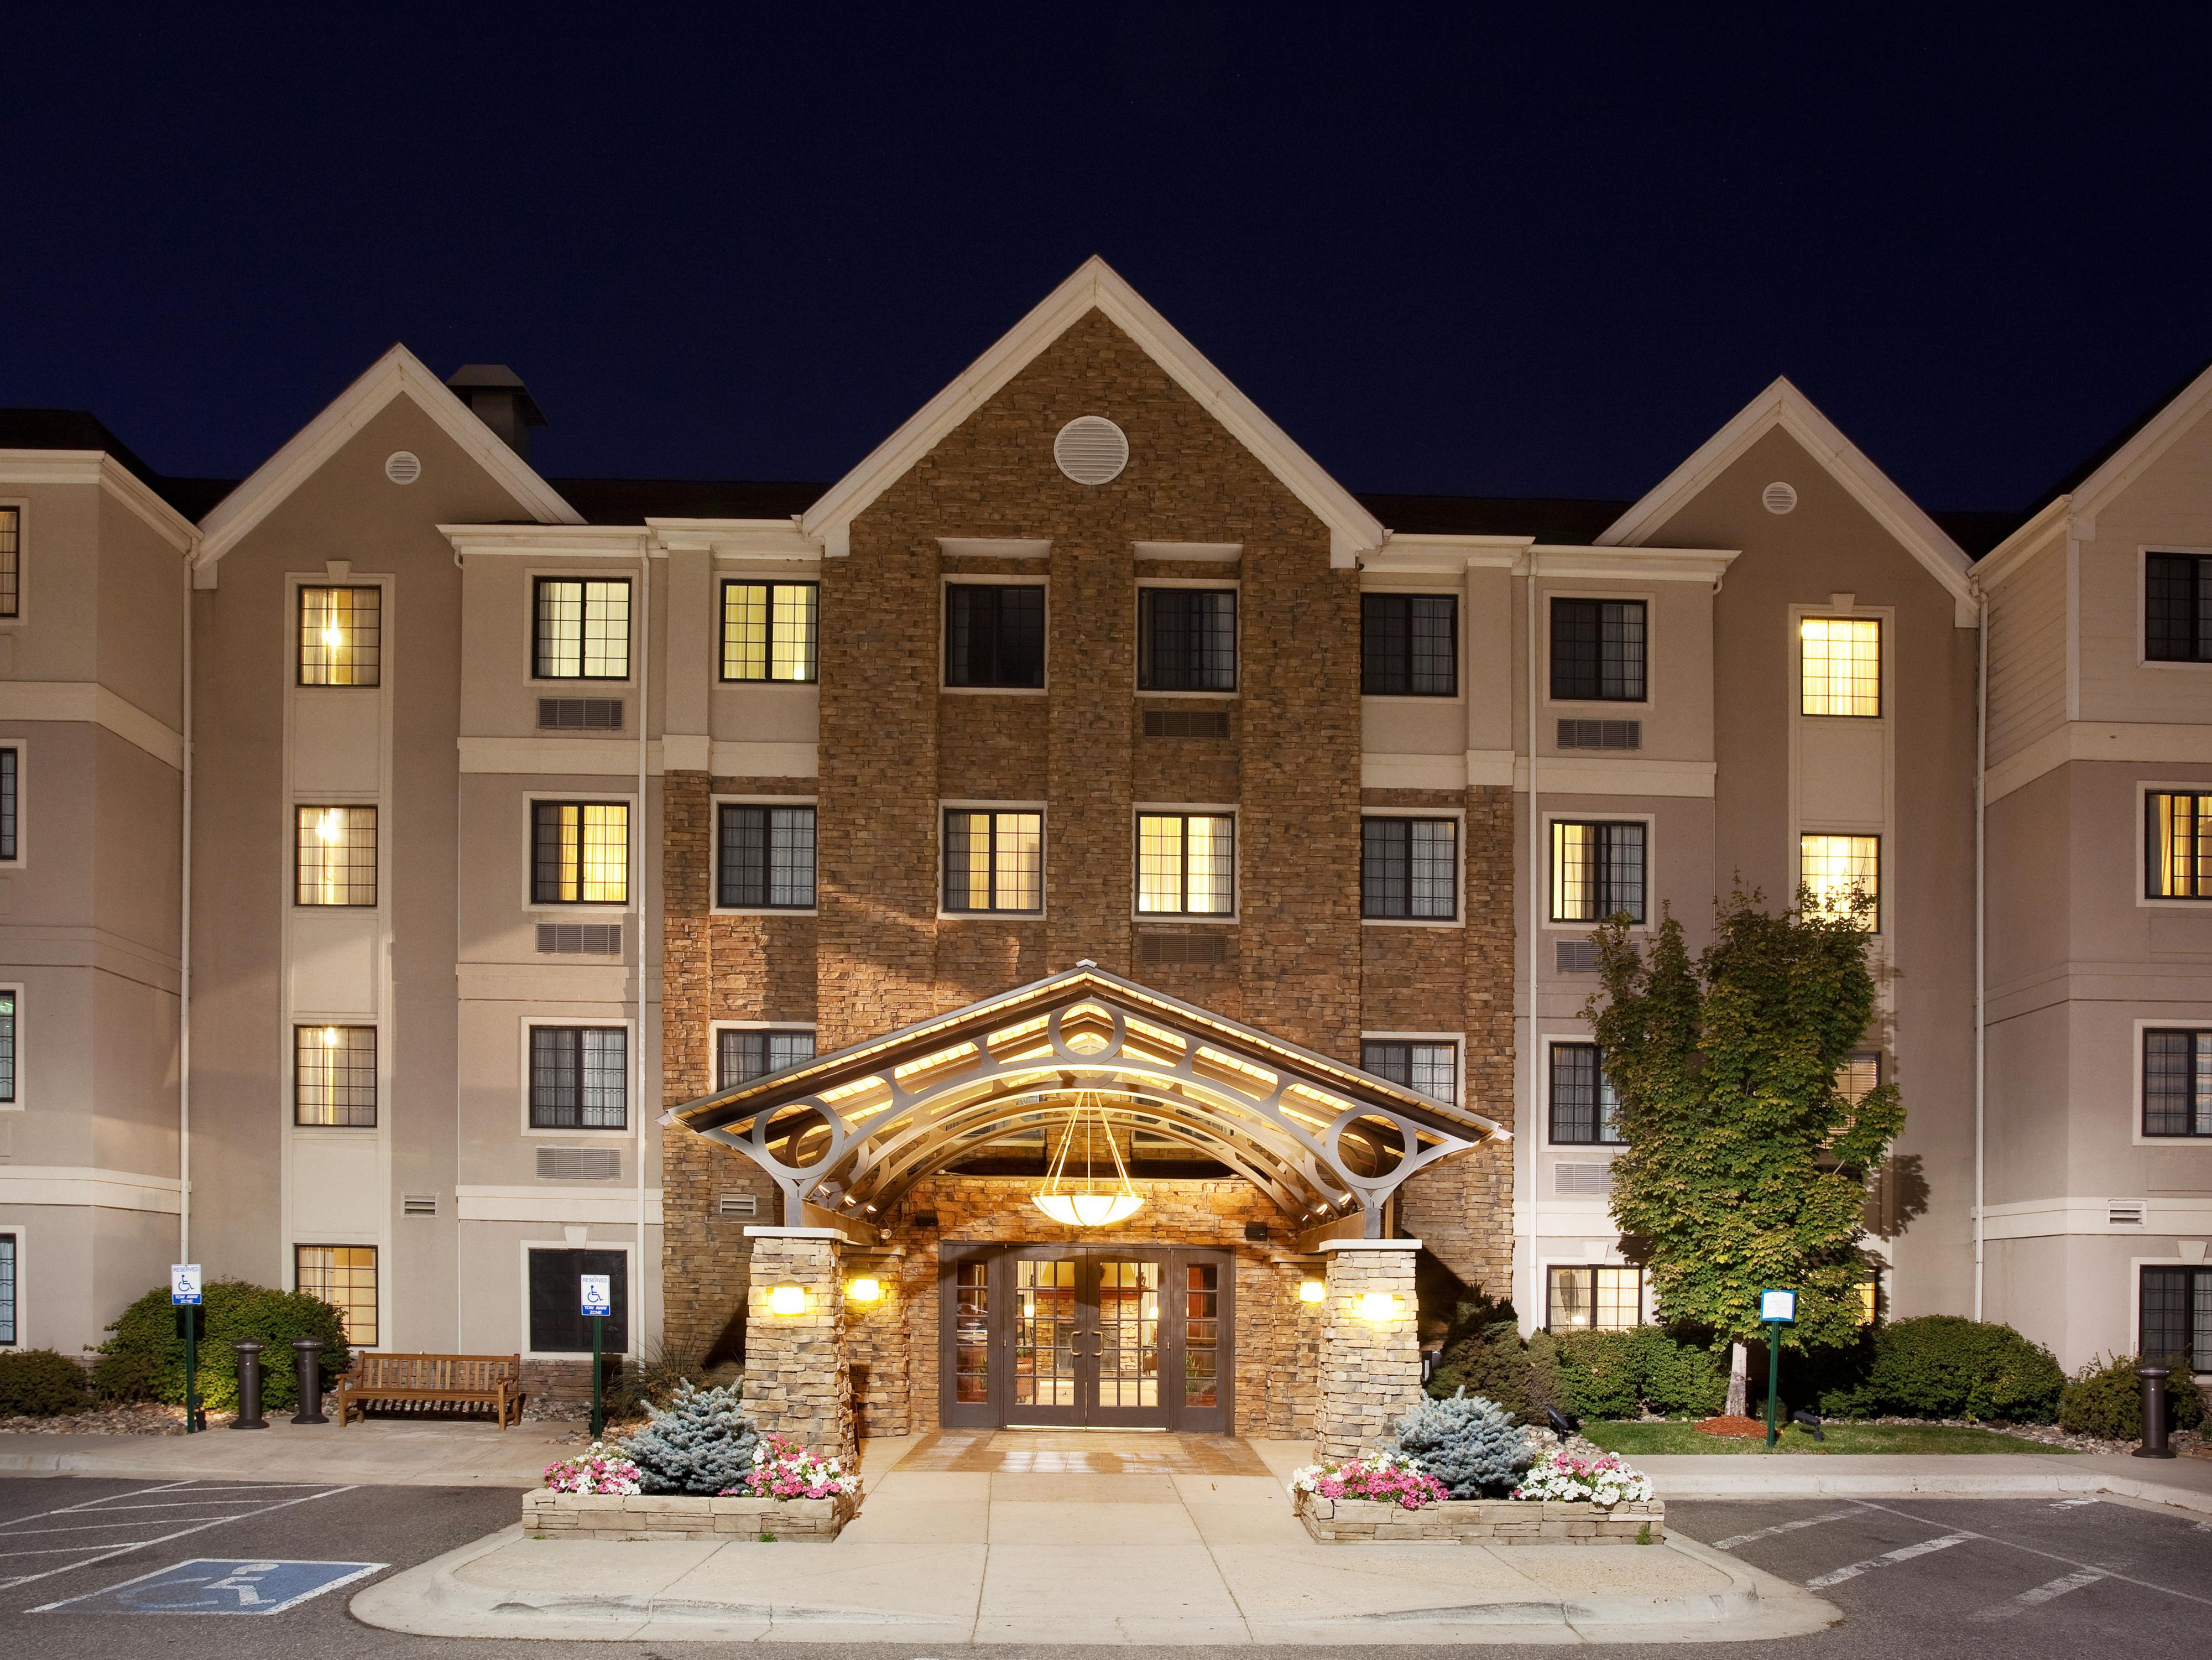 Glendale Hotels: Staybridge Suites Denver-Cherry Creek - Extended ...